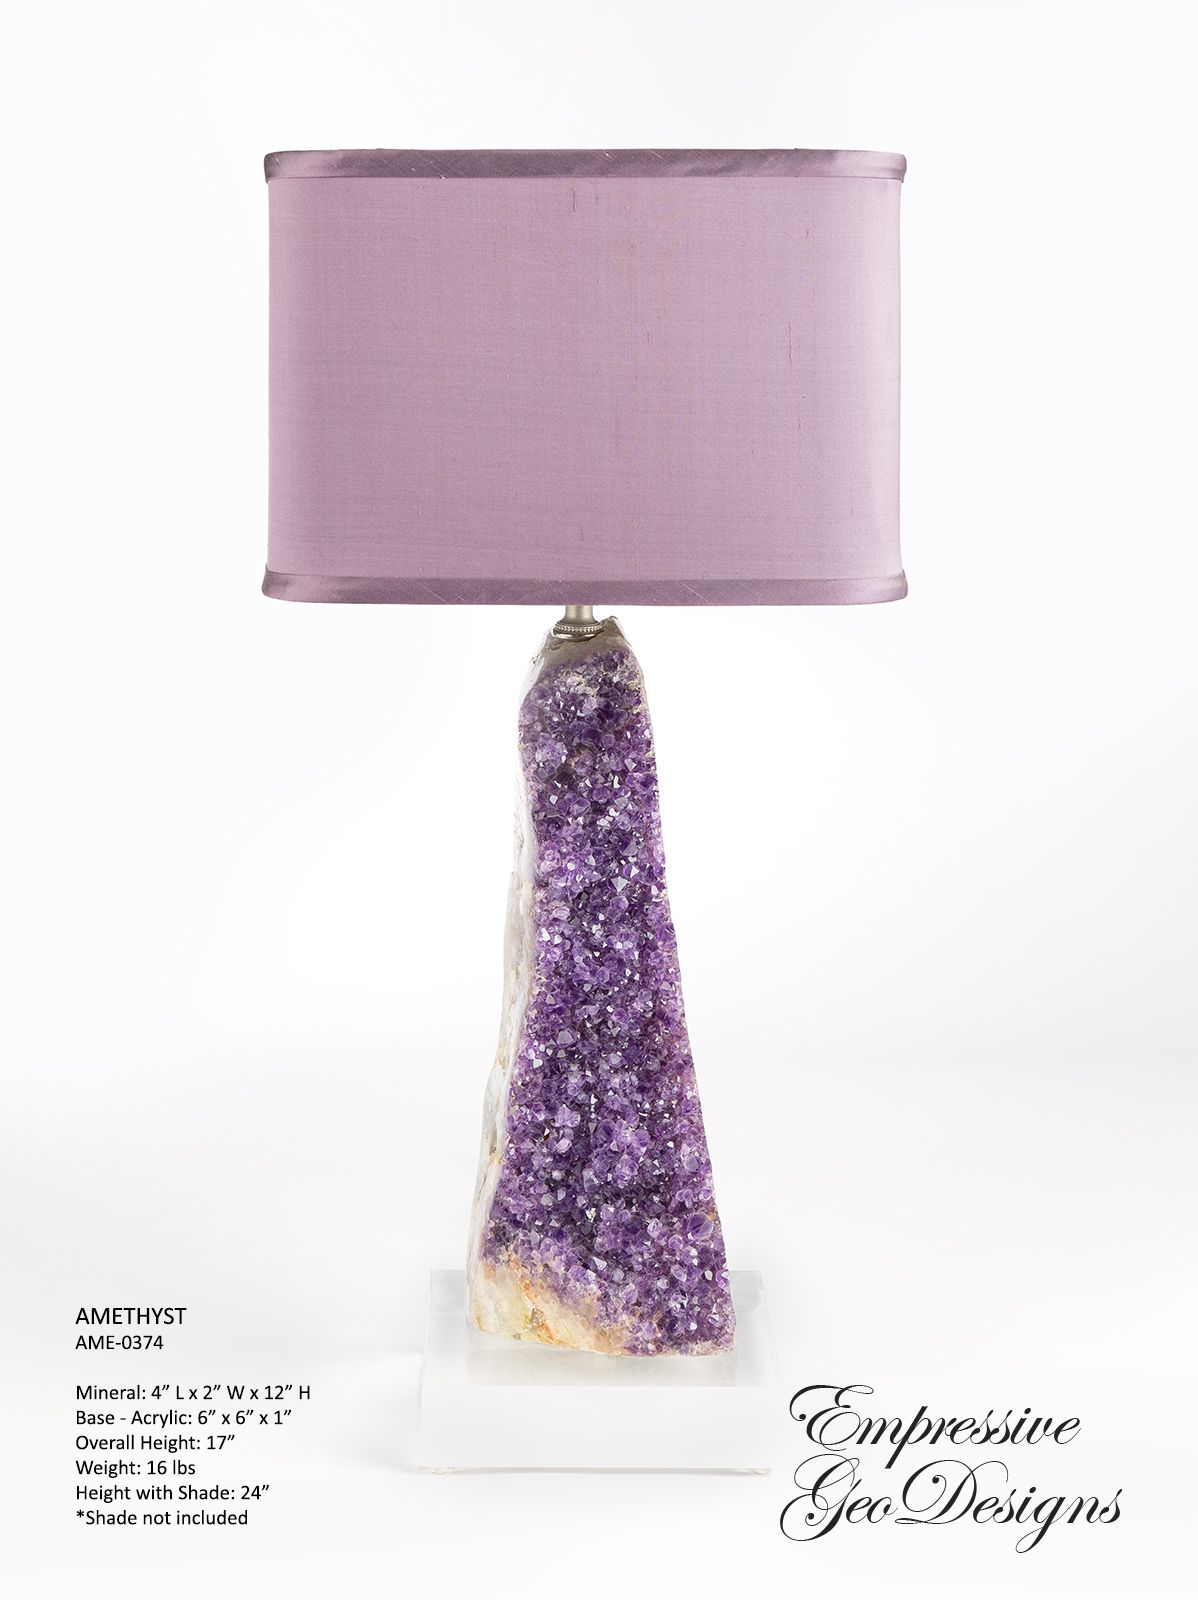 Lamps Purple Geode Decor Lamps Mineral Accessories Amethyst Rocks Quartz Crystals Agate Tables Dallas Tx Crystal Lamp Geode Decor Gemstone Art